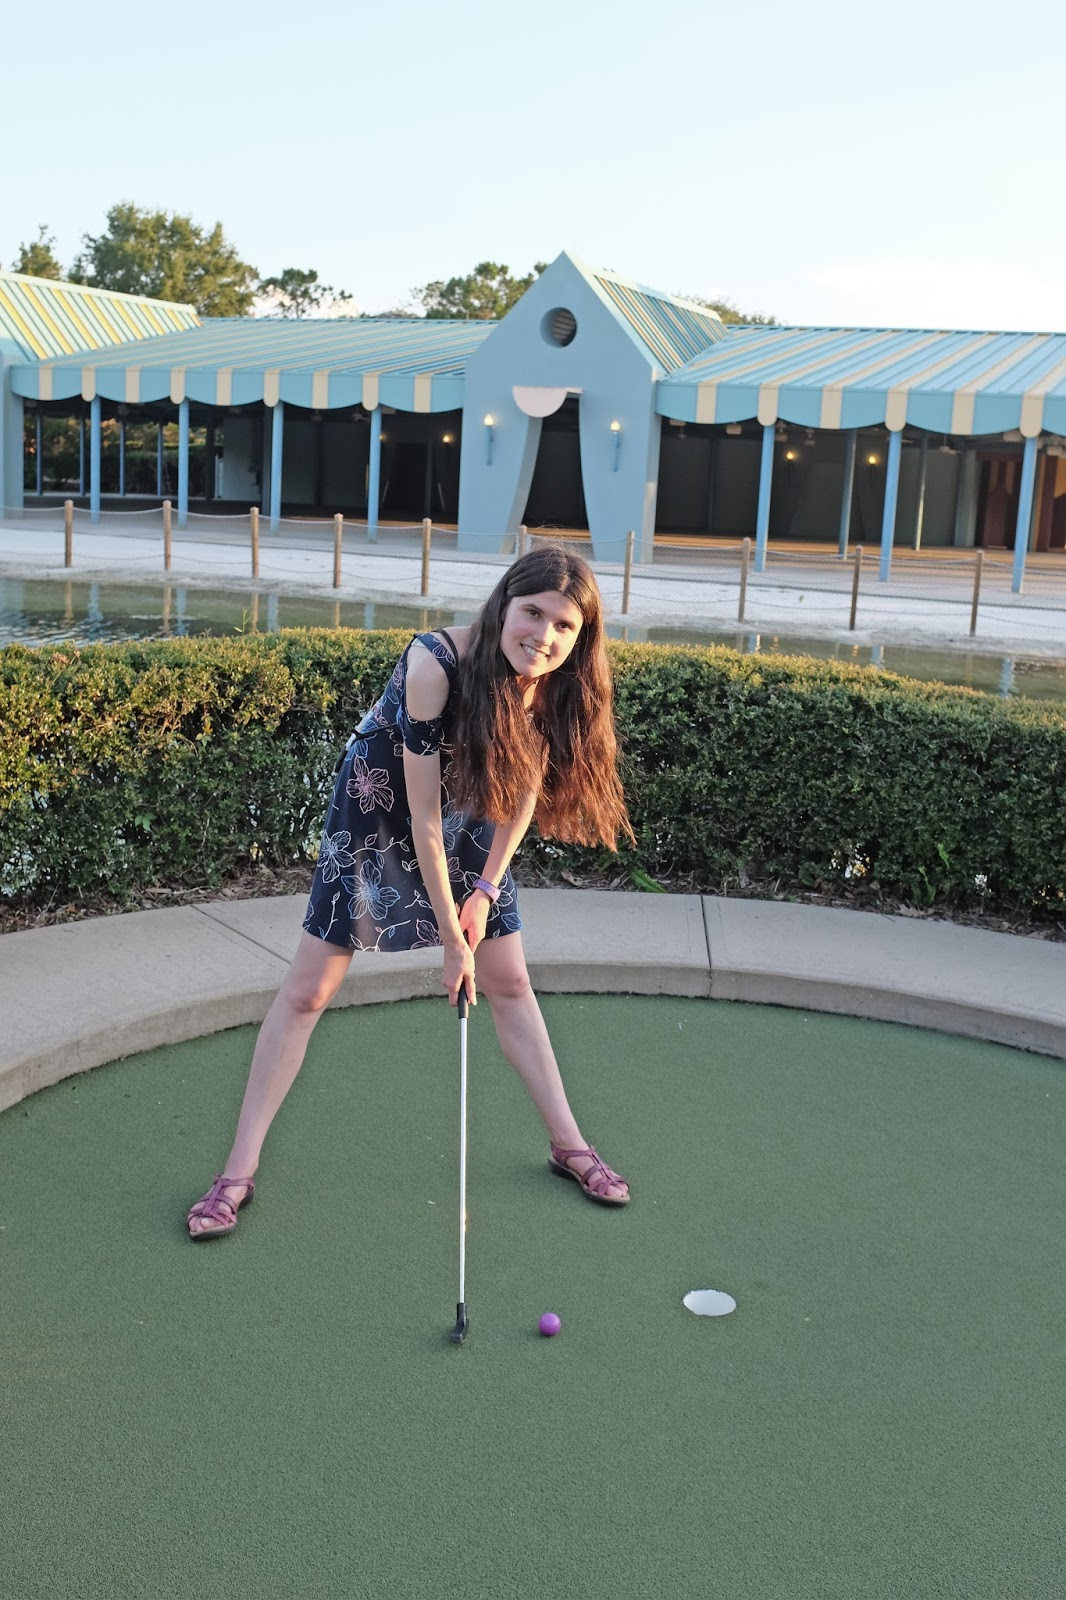 Miniature golf at Walt Disney World